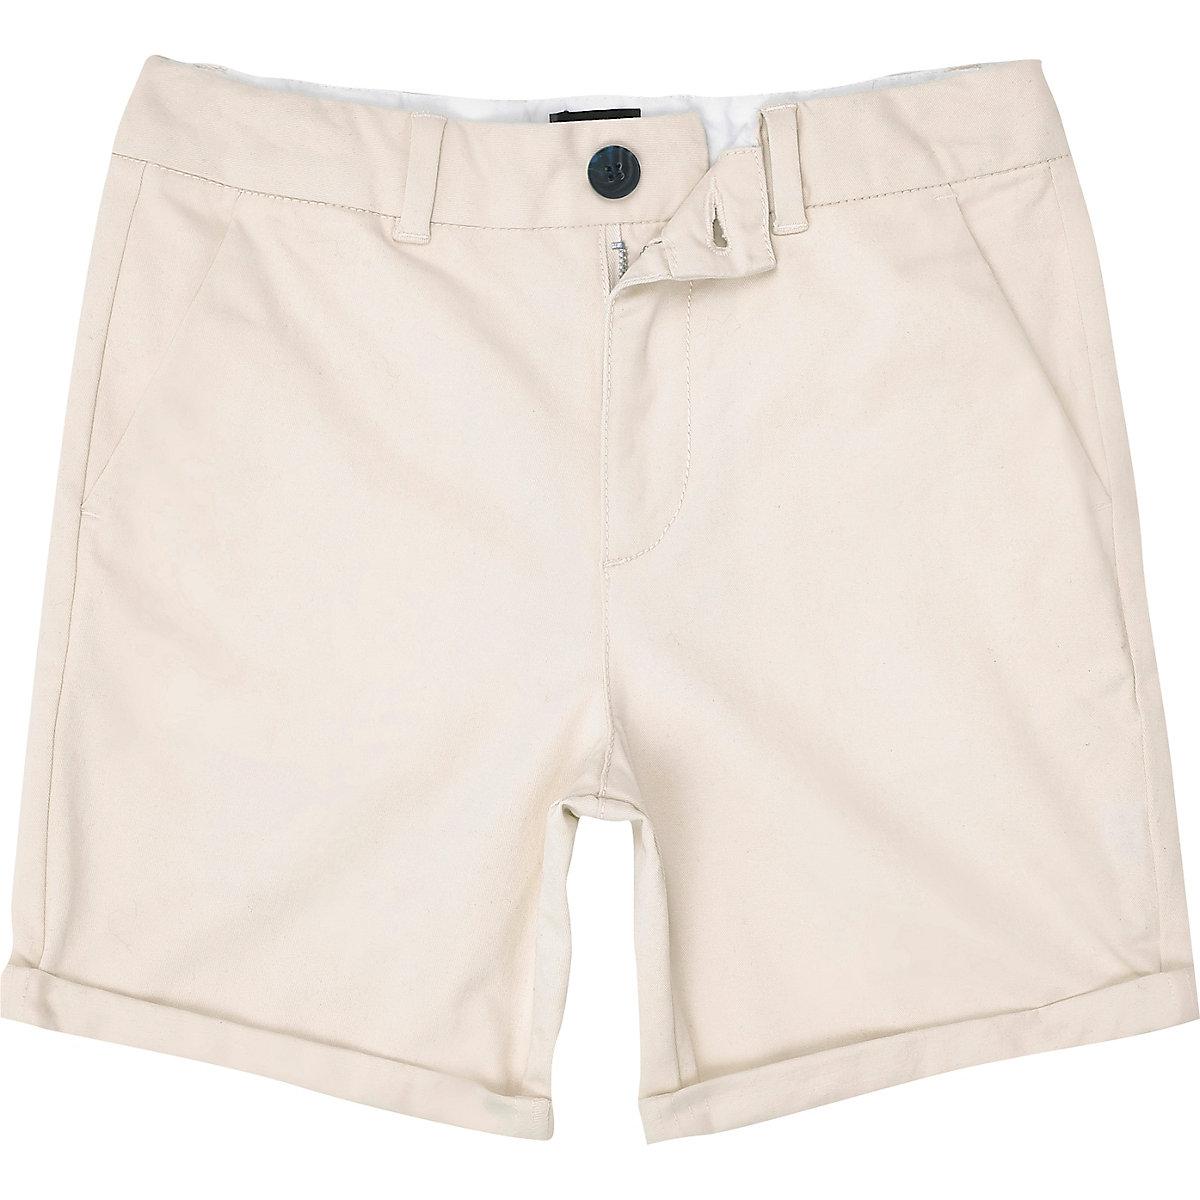 Boys stone slim fit smart chino shorts